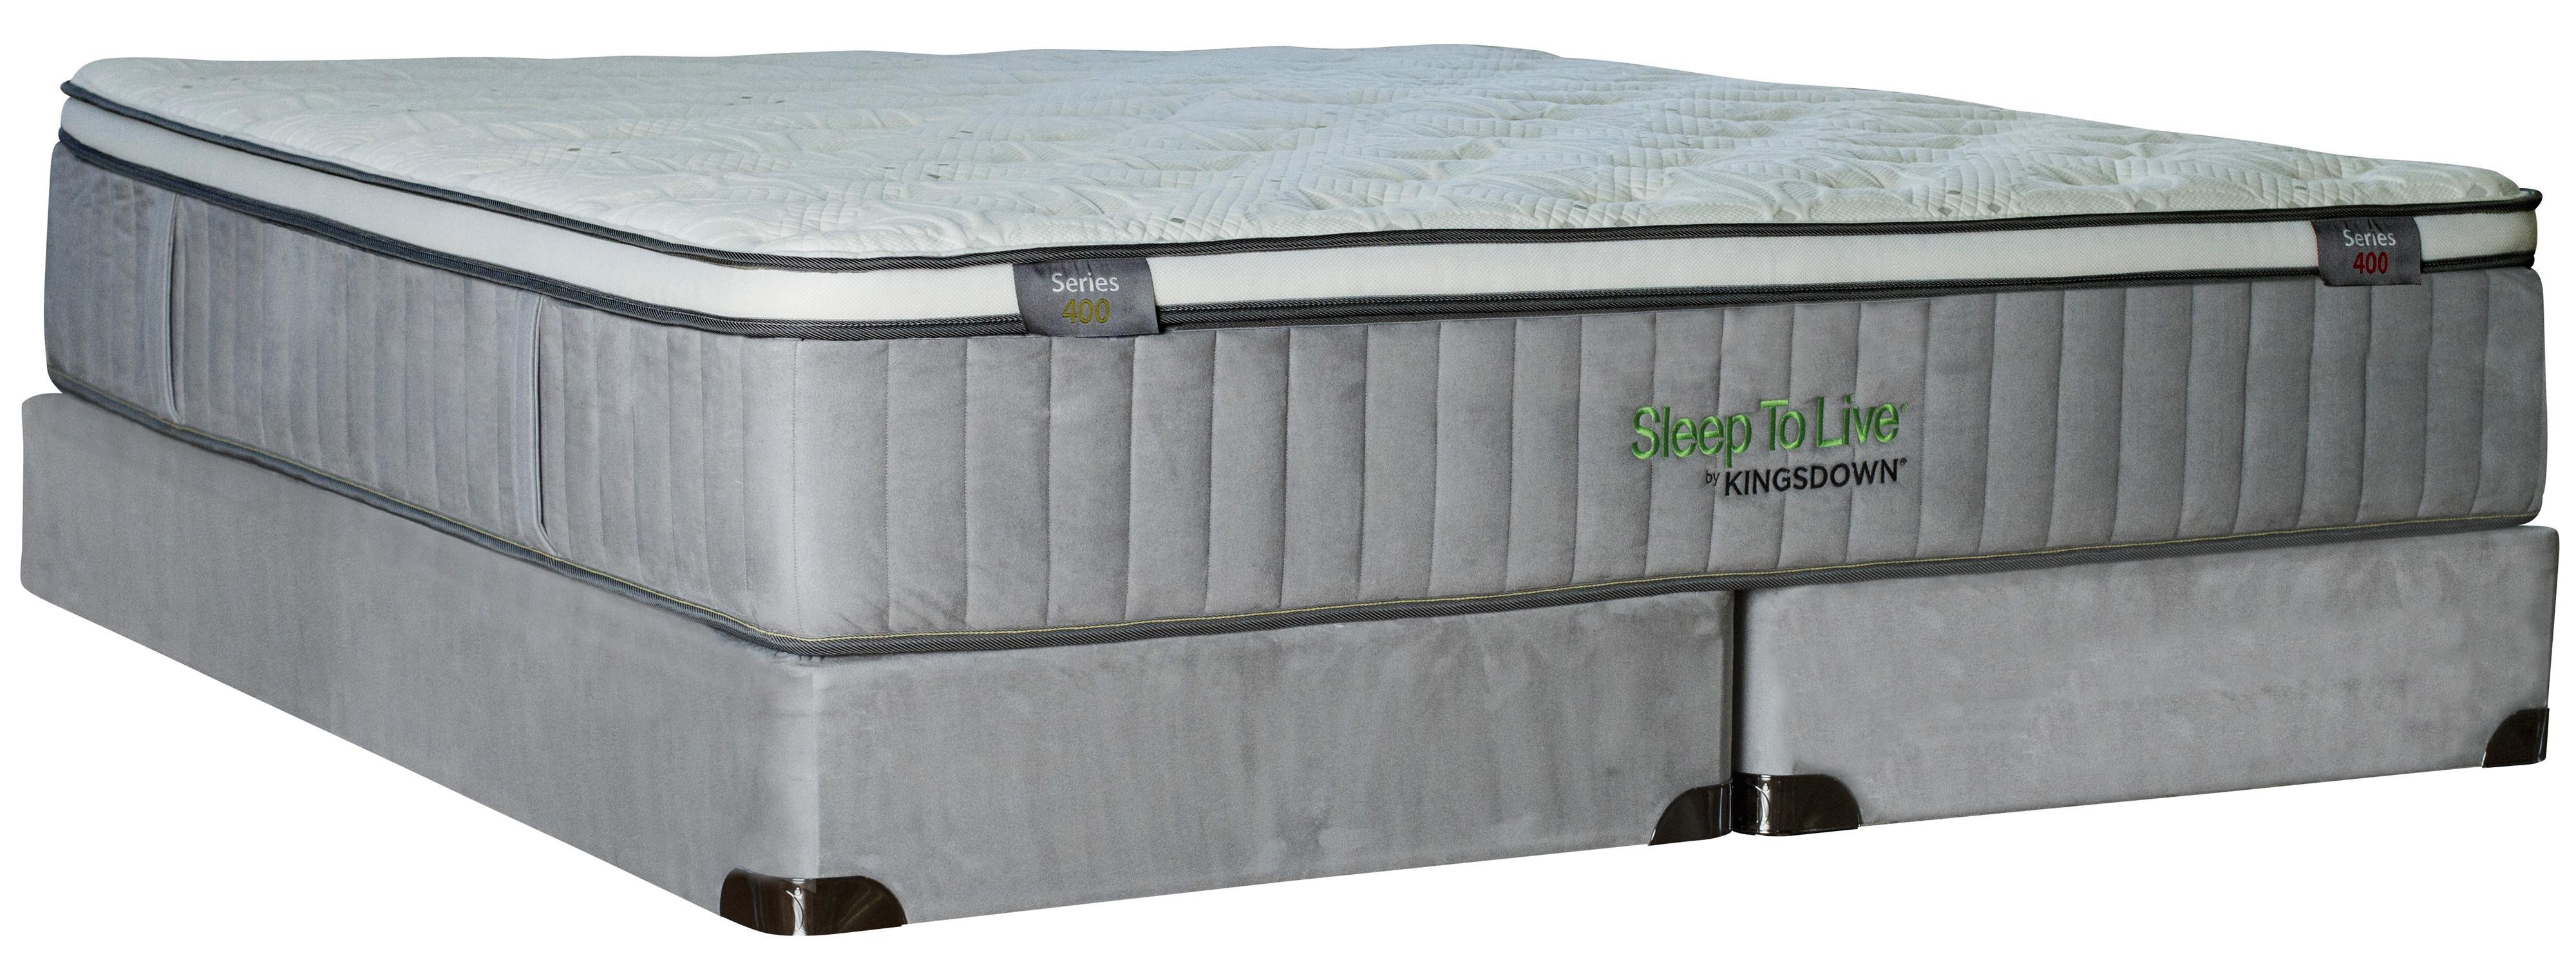 Kingsdown Sleep To Live 400 King Euro Top Mattress Set with Memory Foam - Item Number: Series400-K+2x1128SFH-TXL